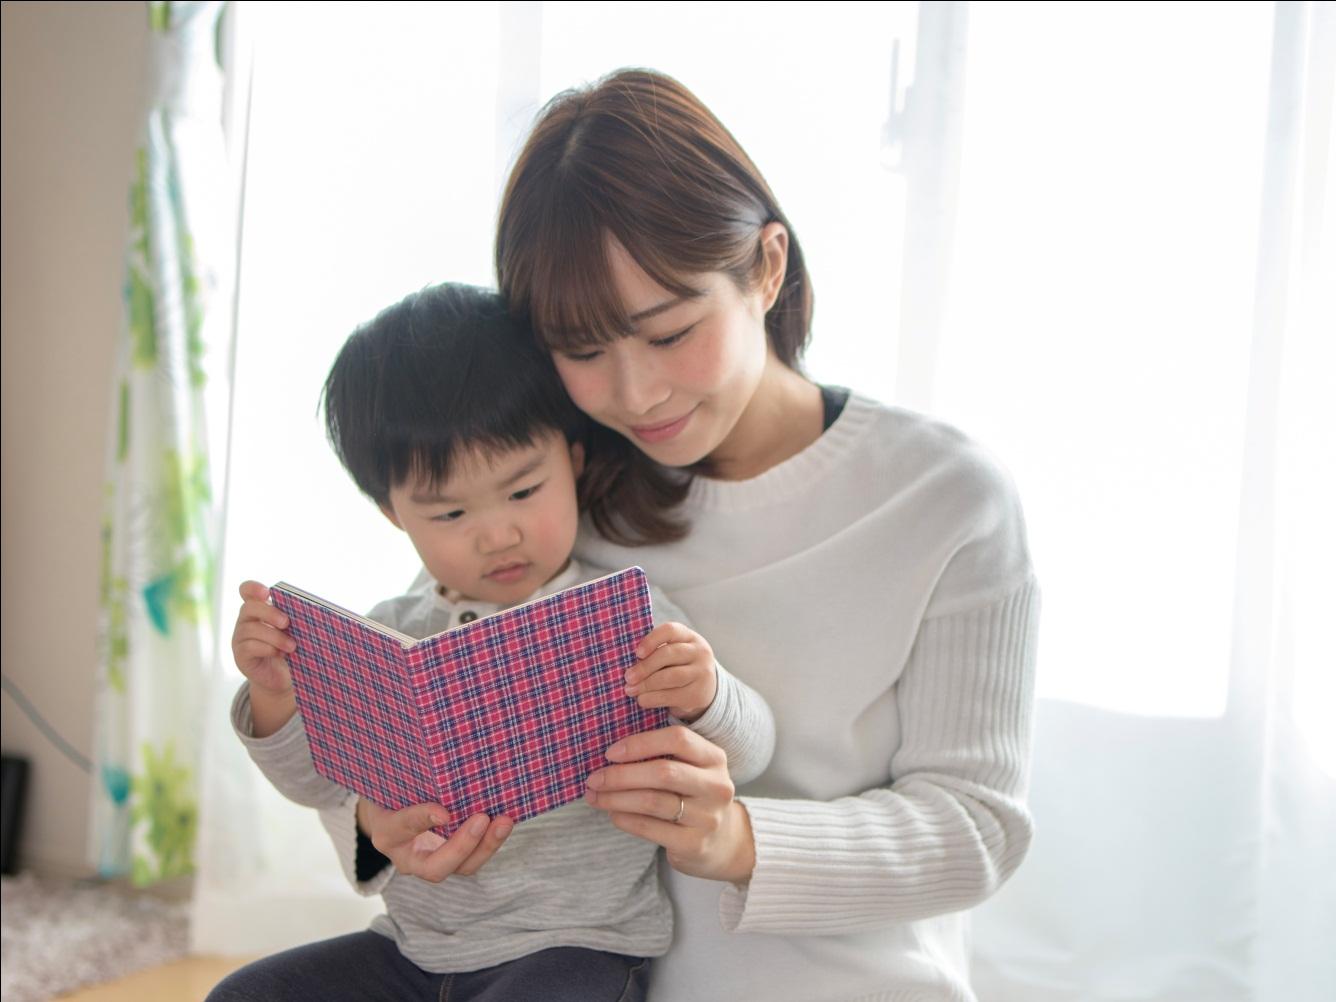 8 Cara Menyenangkan Membuat Si Kecil Gemar Membaca